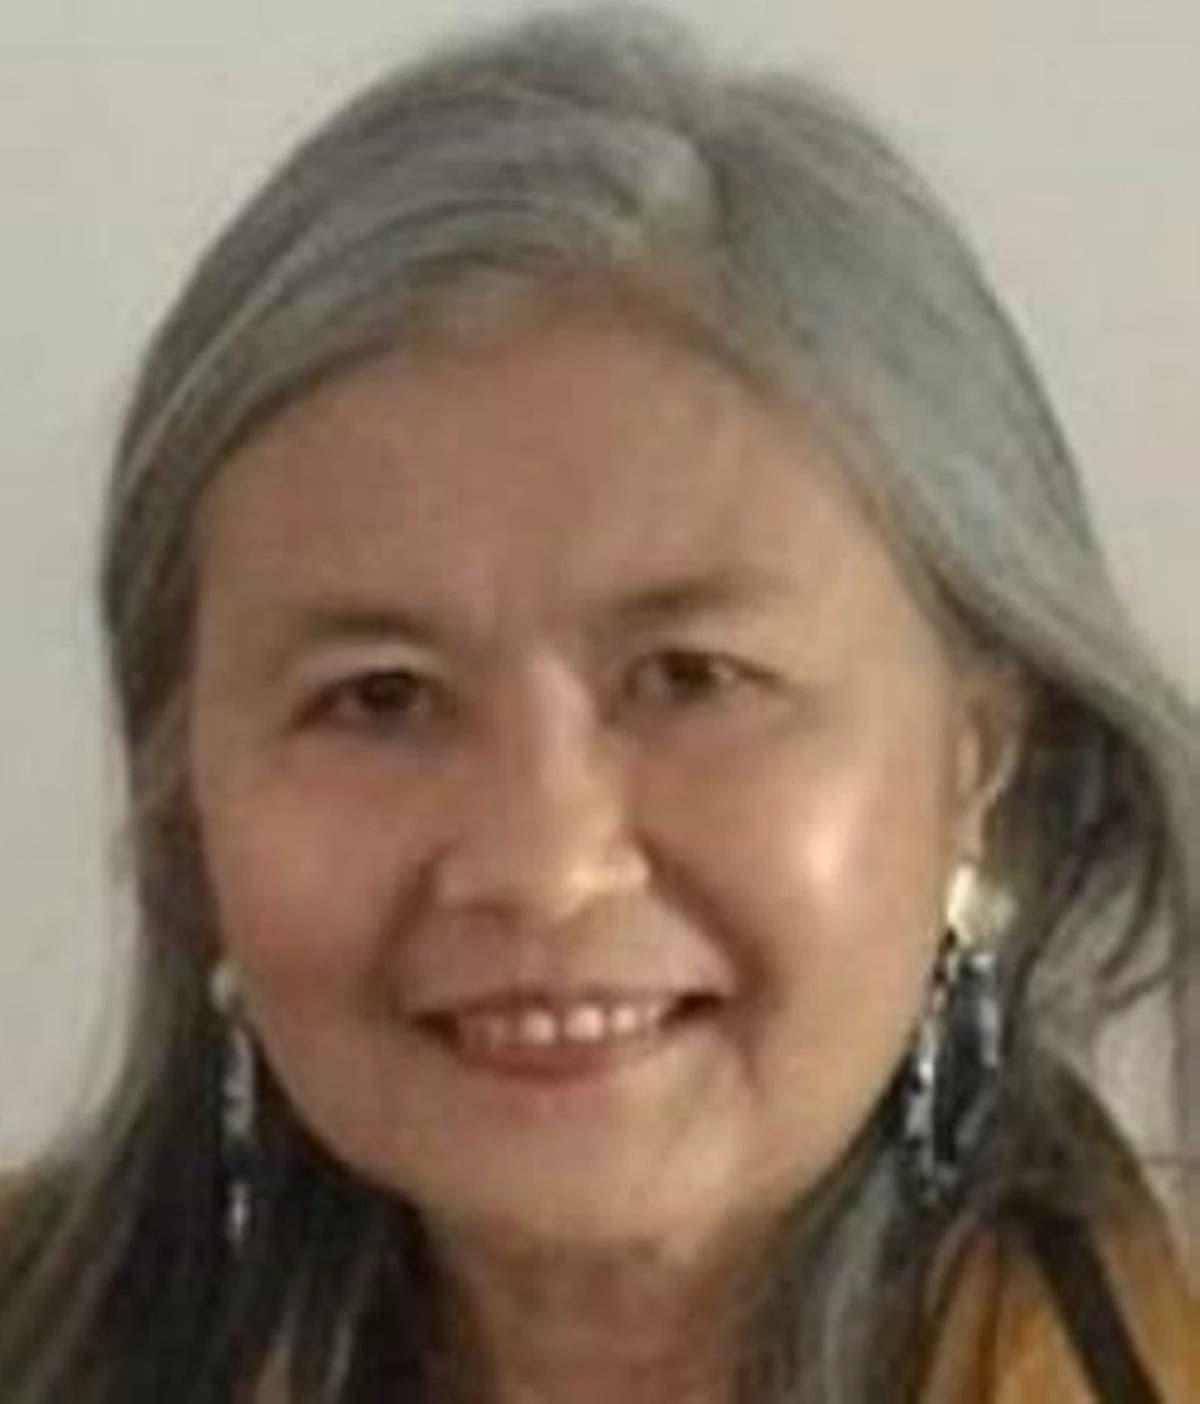 Woman denies killing Londoner and dumping headless body 250 a milhas de distância